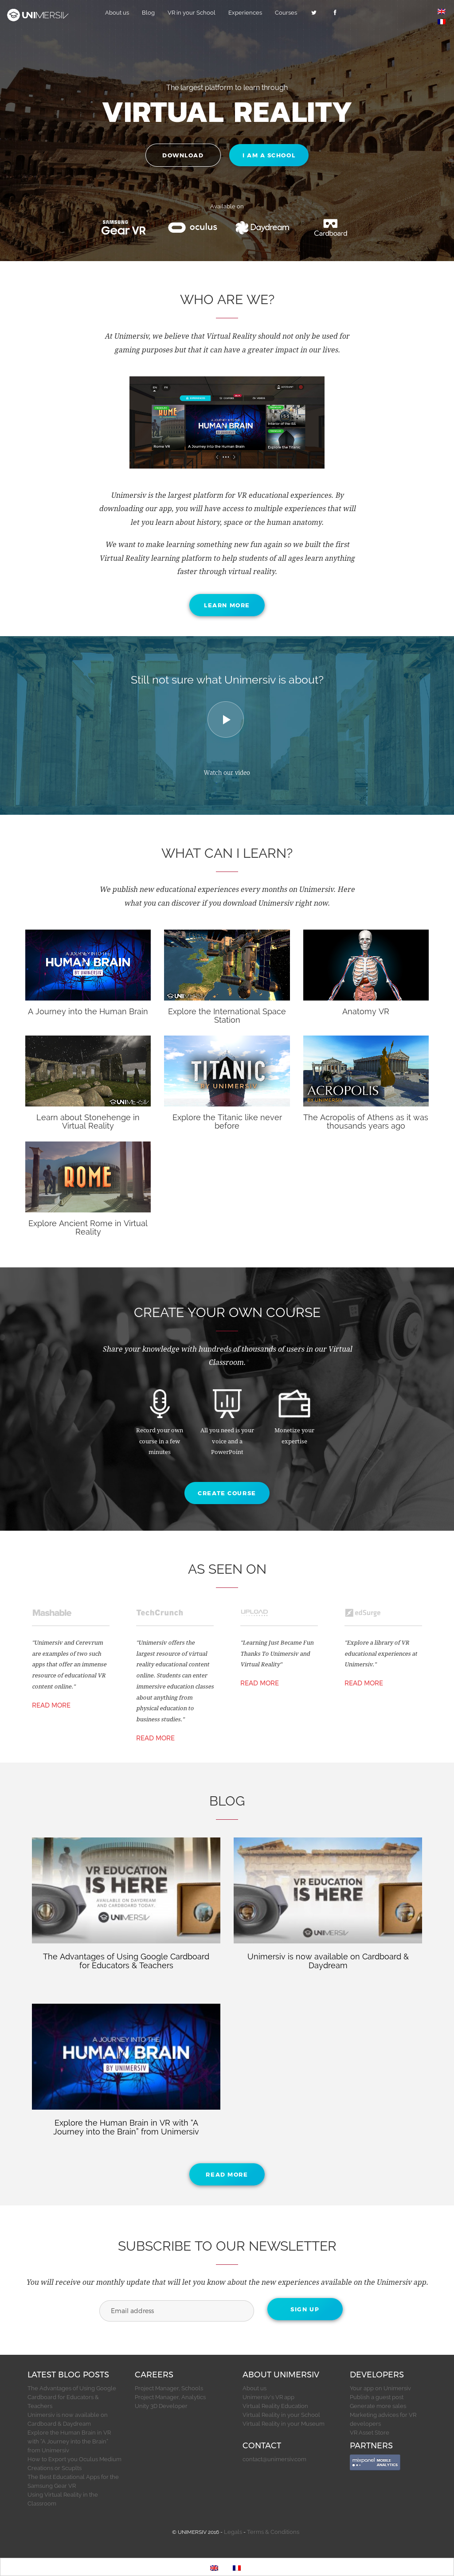 Unimersiv Competitors, Revenue and Employees - Owler Company